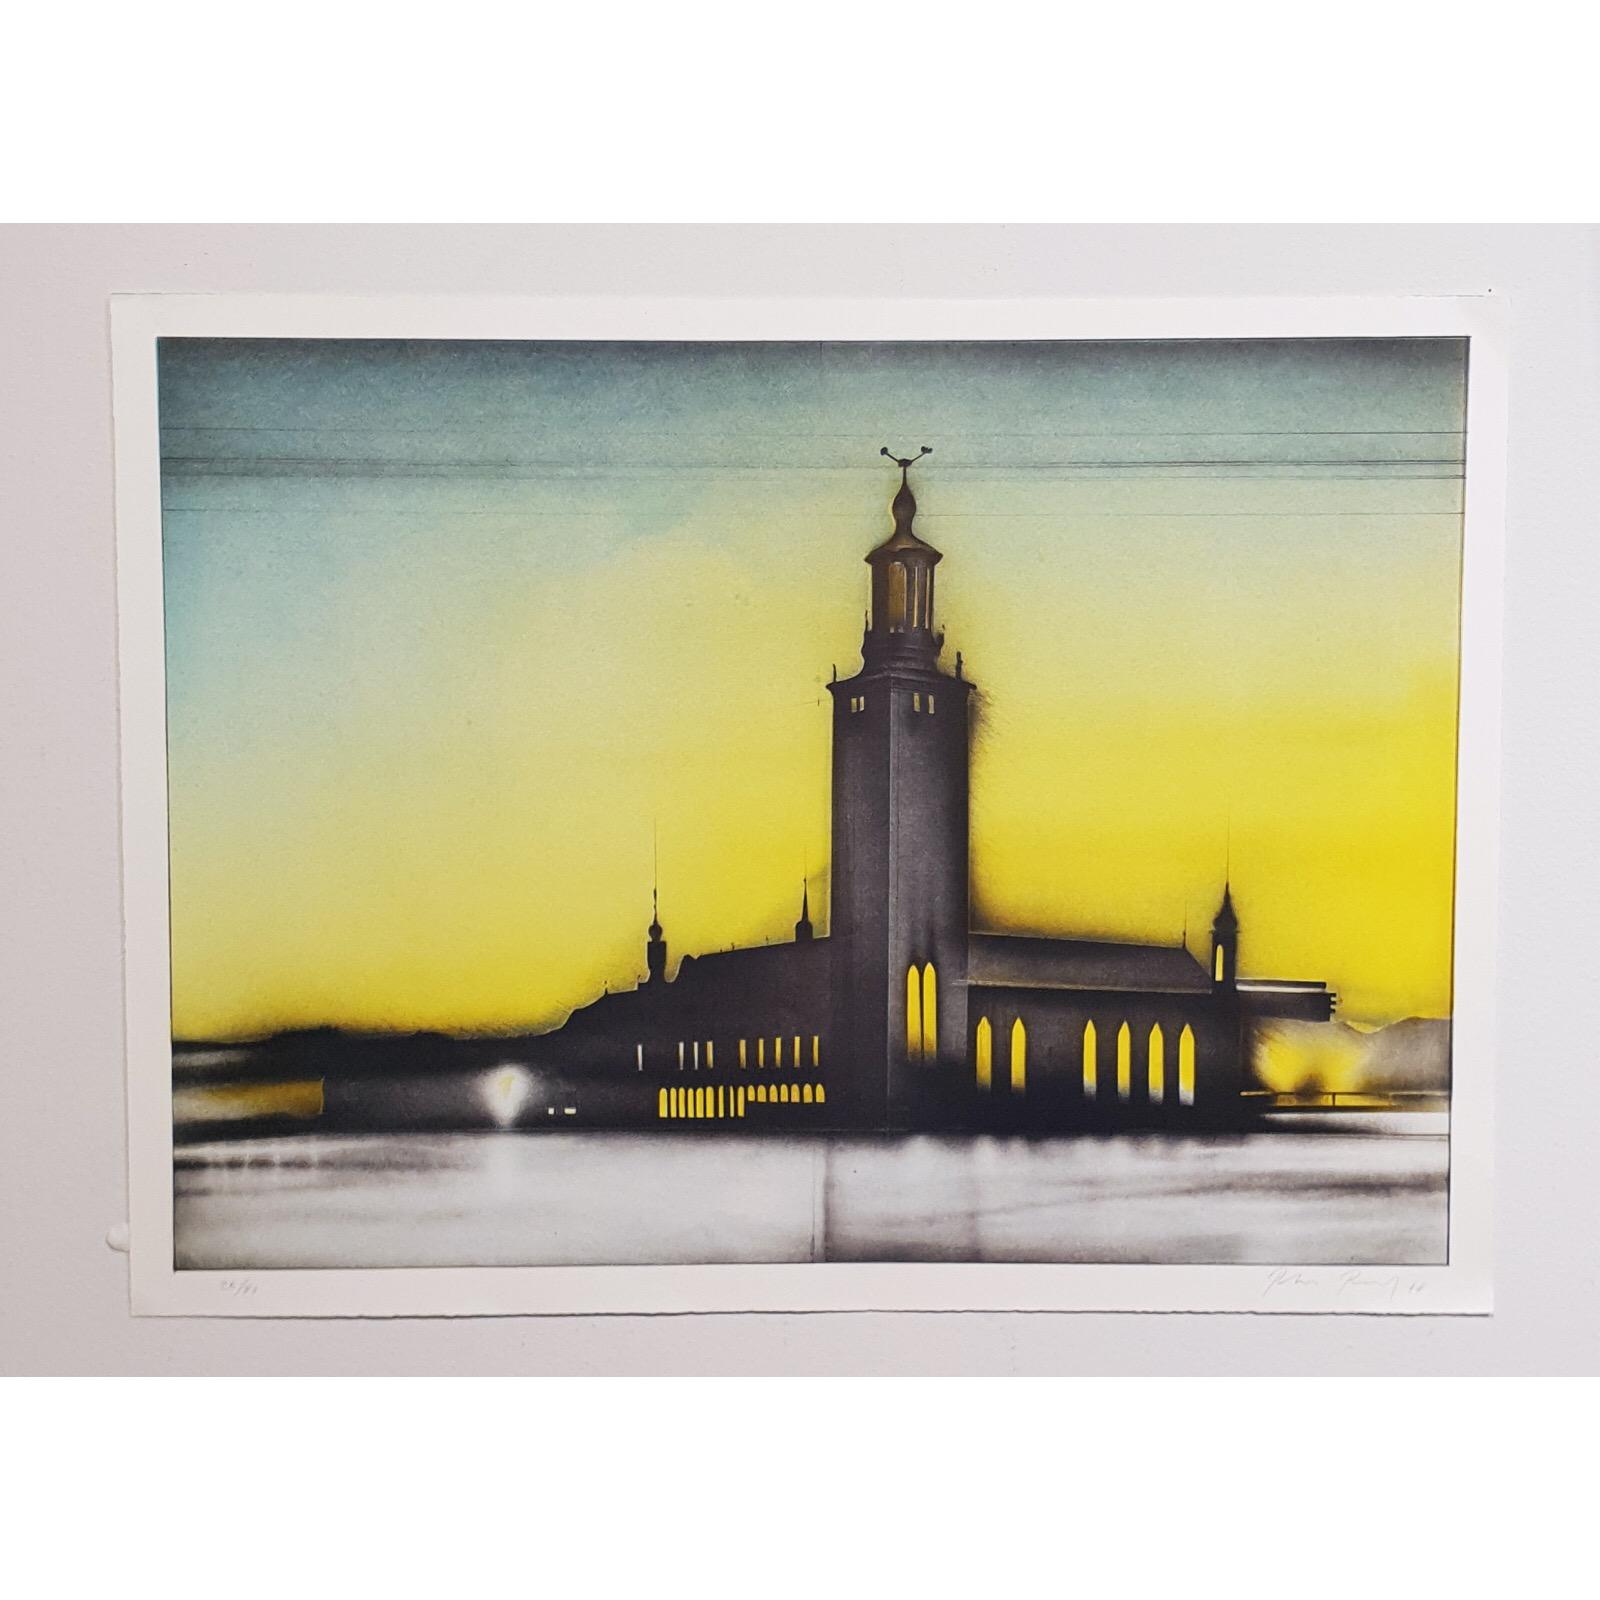 """Townhall im Französischen Schatten"" Lithograph by Peter Paul. 75x56 cm"